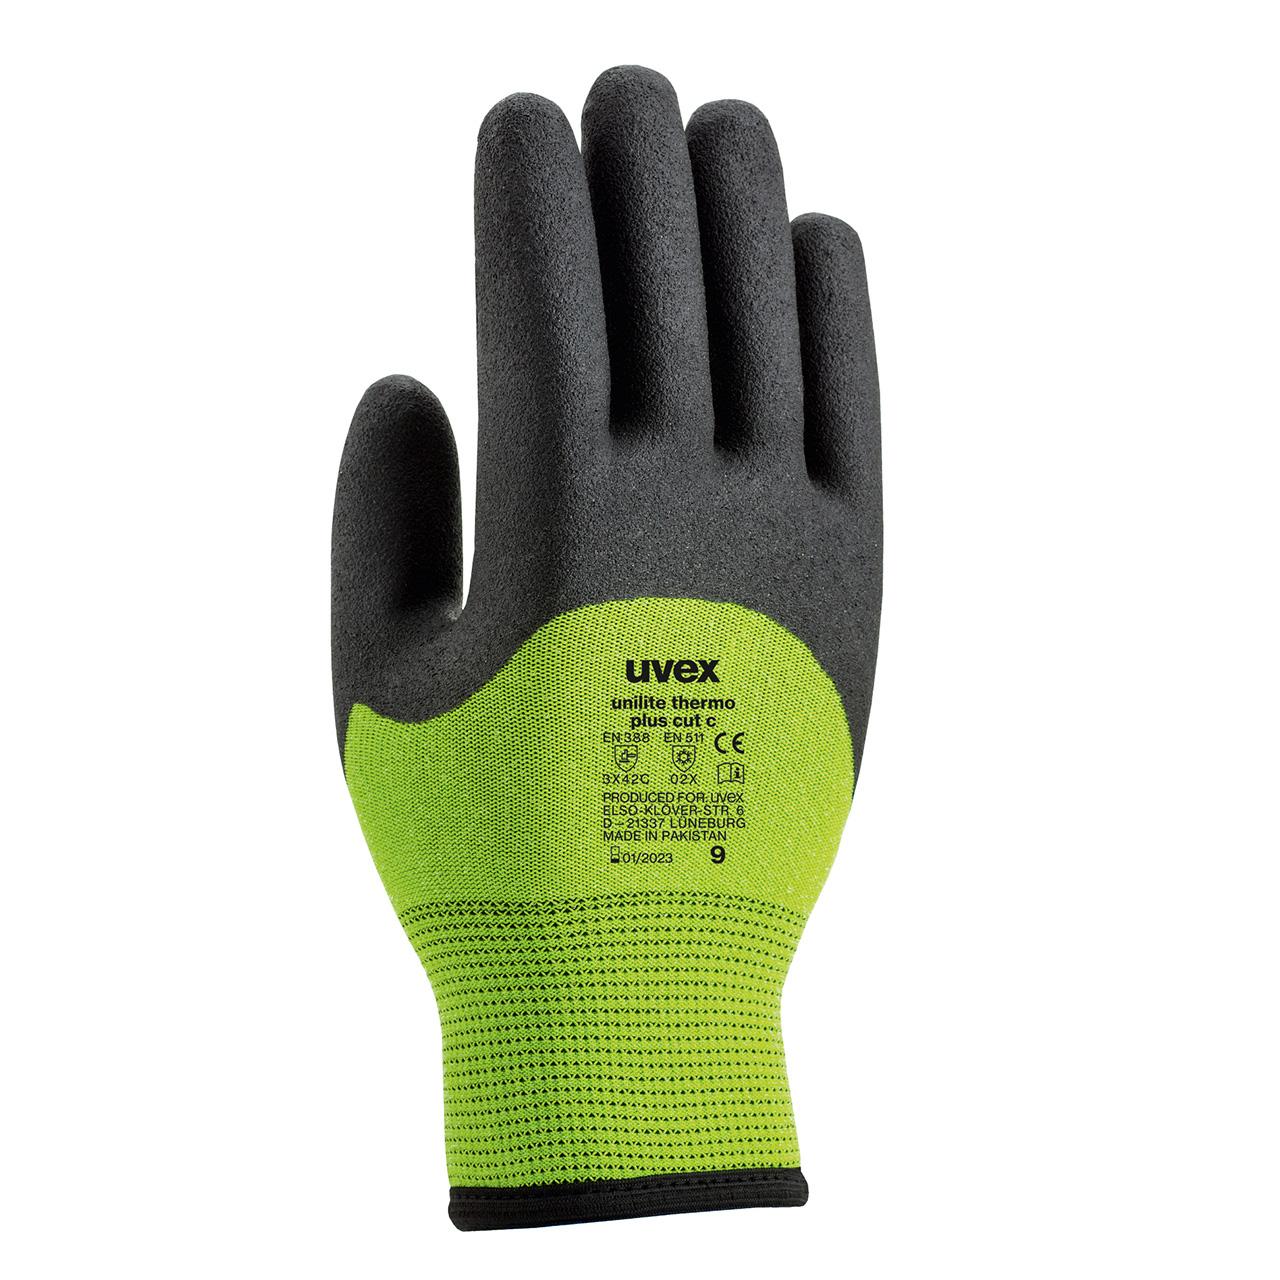 Bootsport Neopren Handschuhe UVEX Größe S